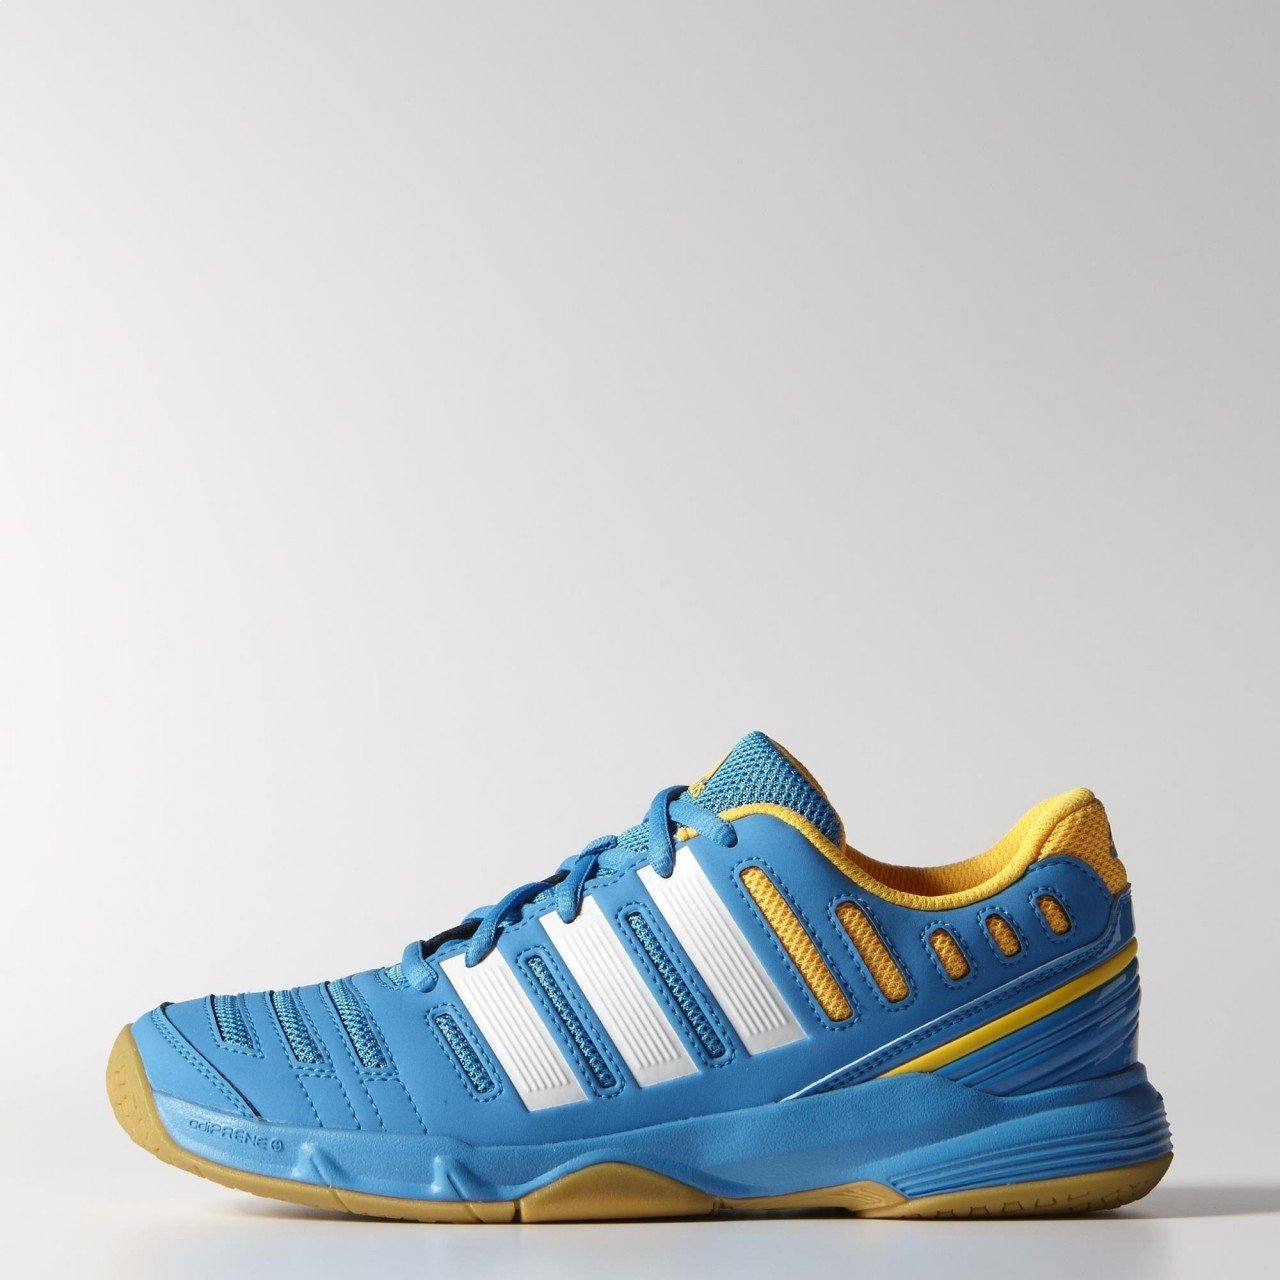 Adidas Court Stabil 11 XJ M20244: Amazon.co.uk: Shoes & Bags